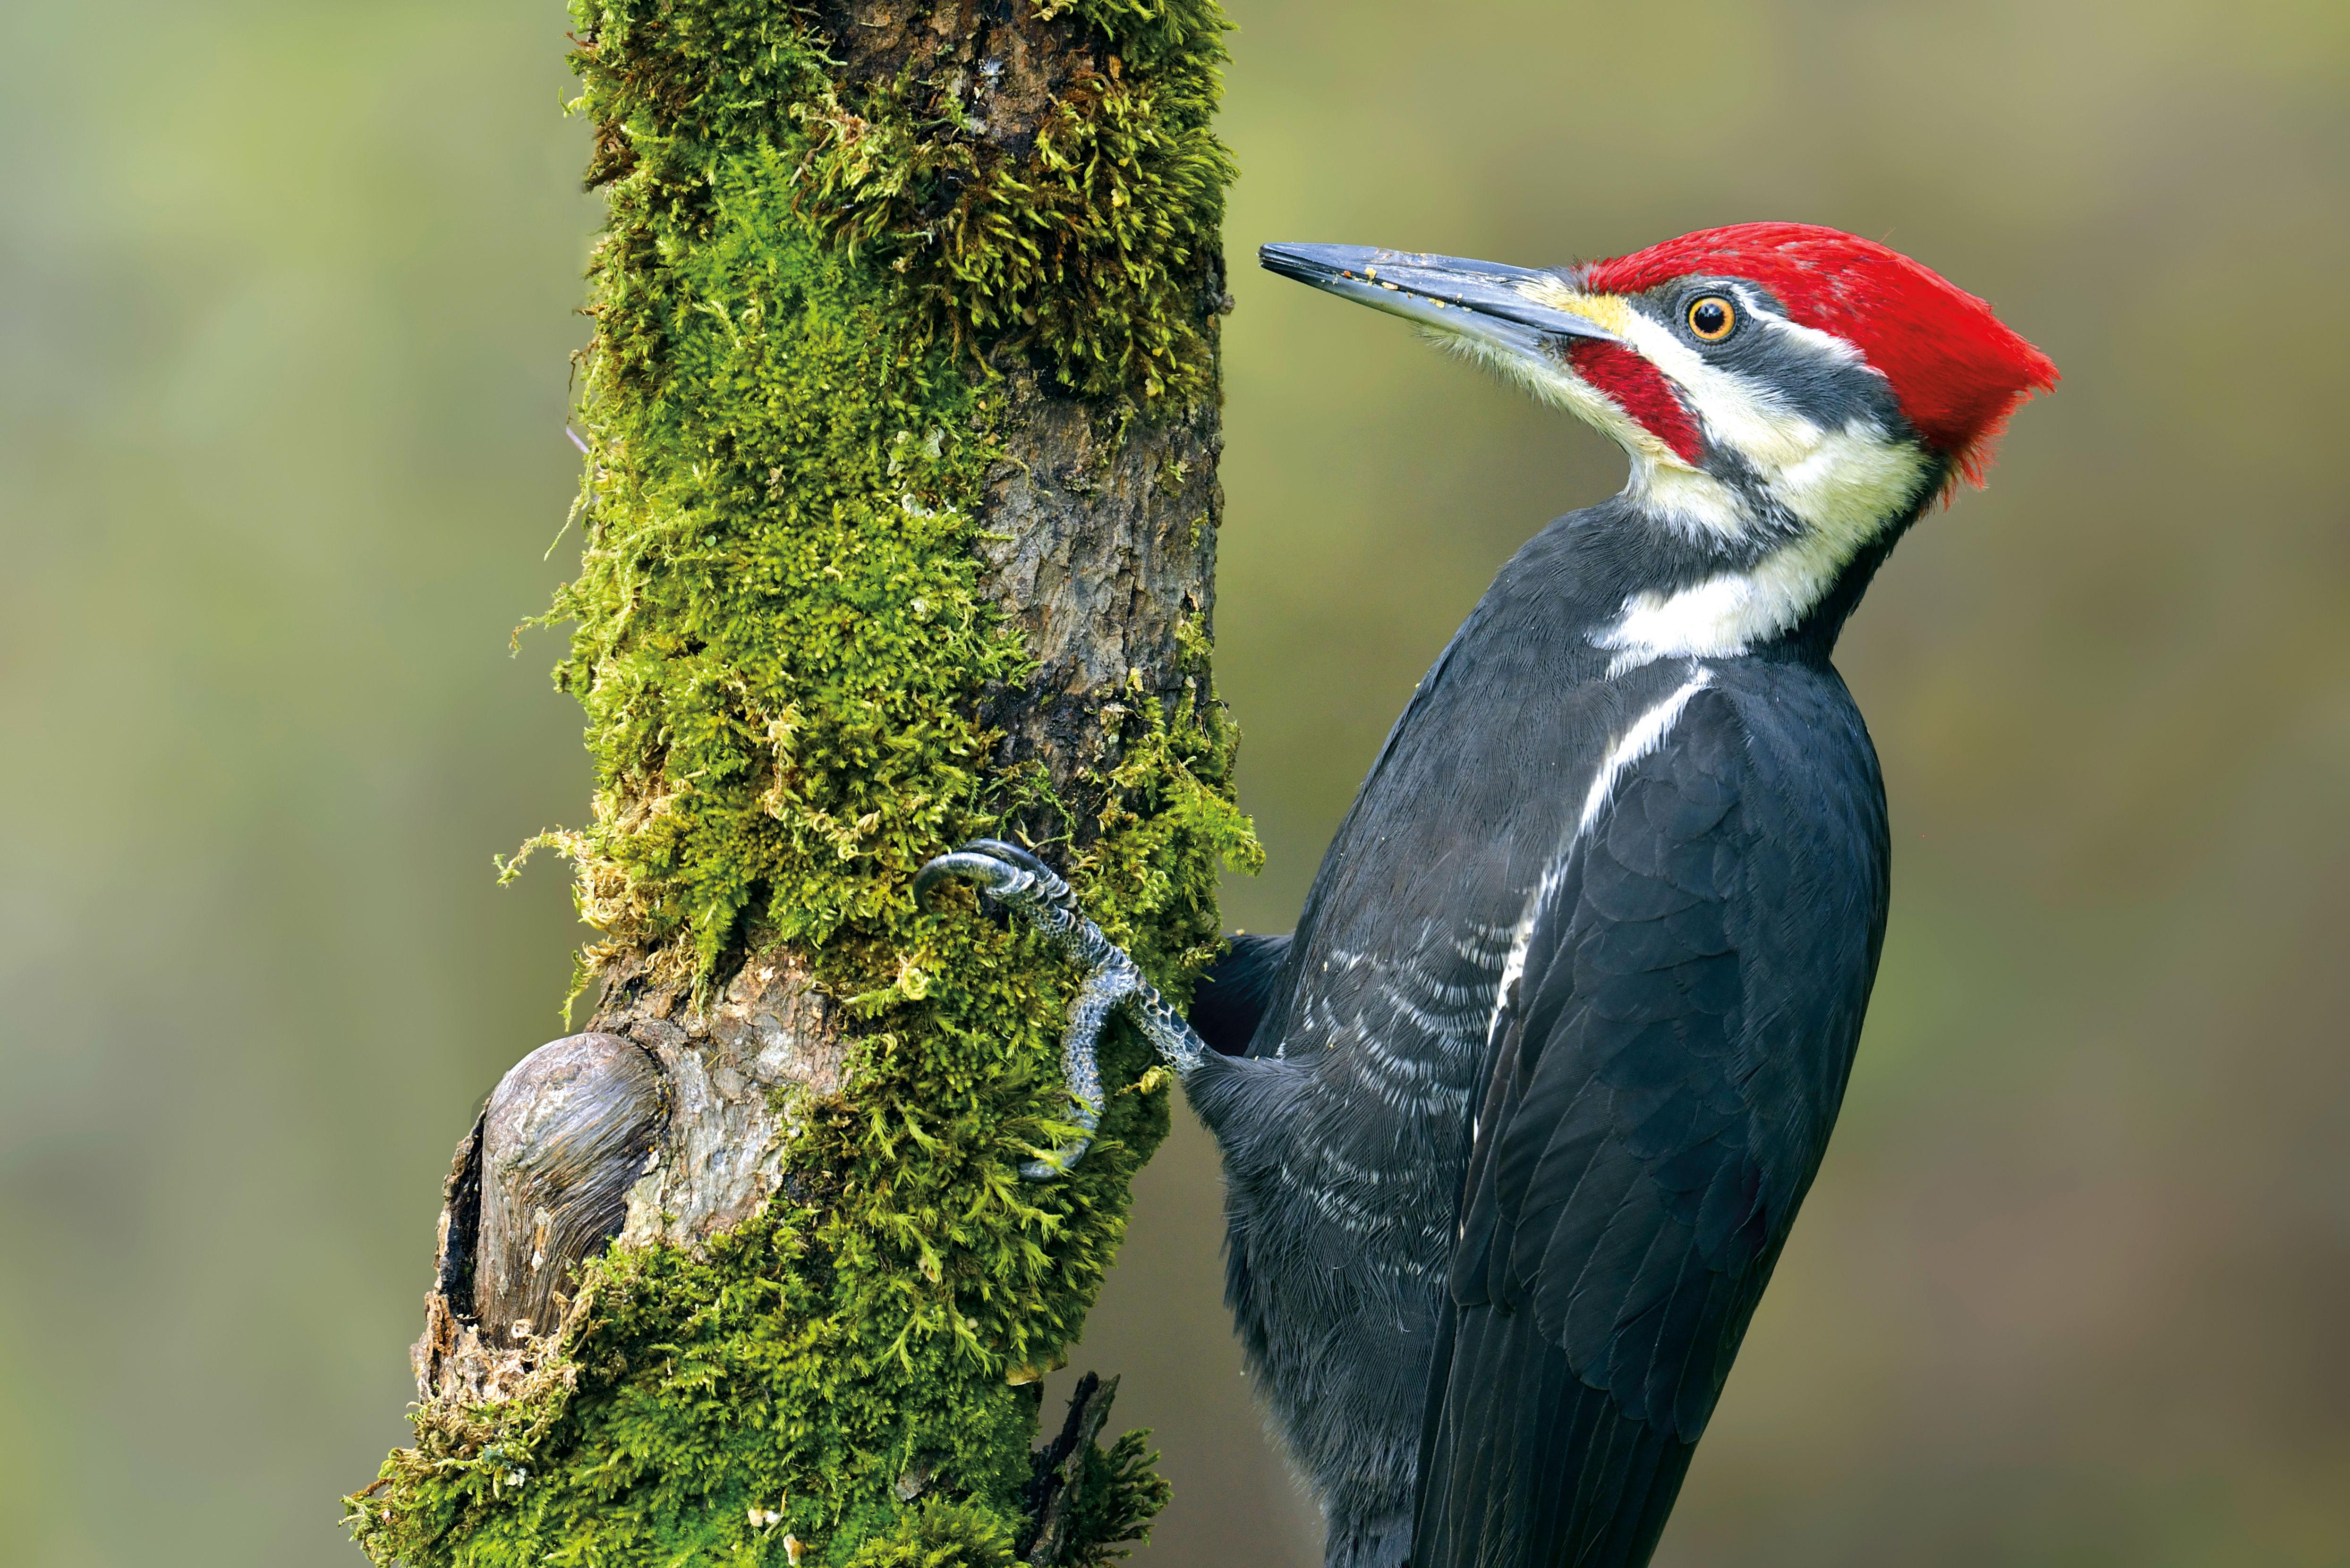 0617 forest park woodpecker soudju